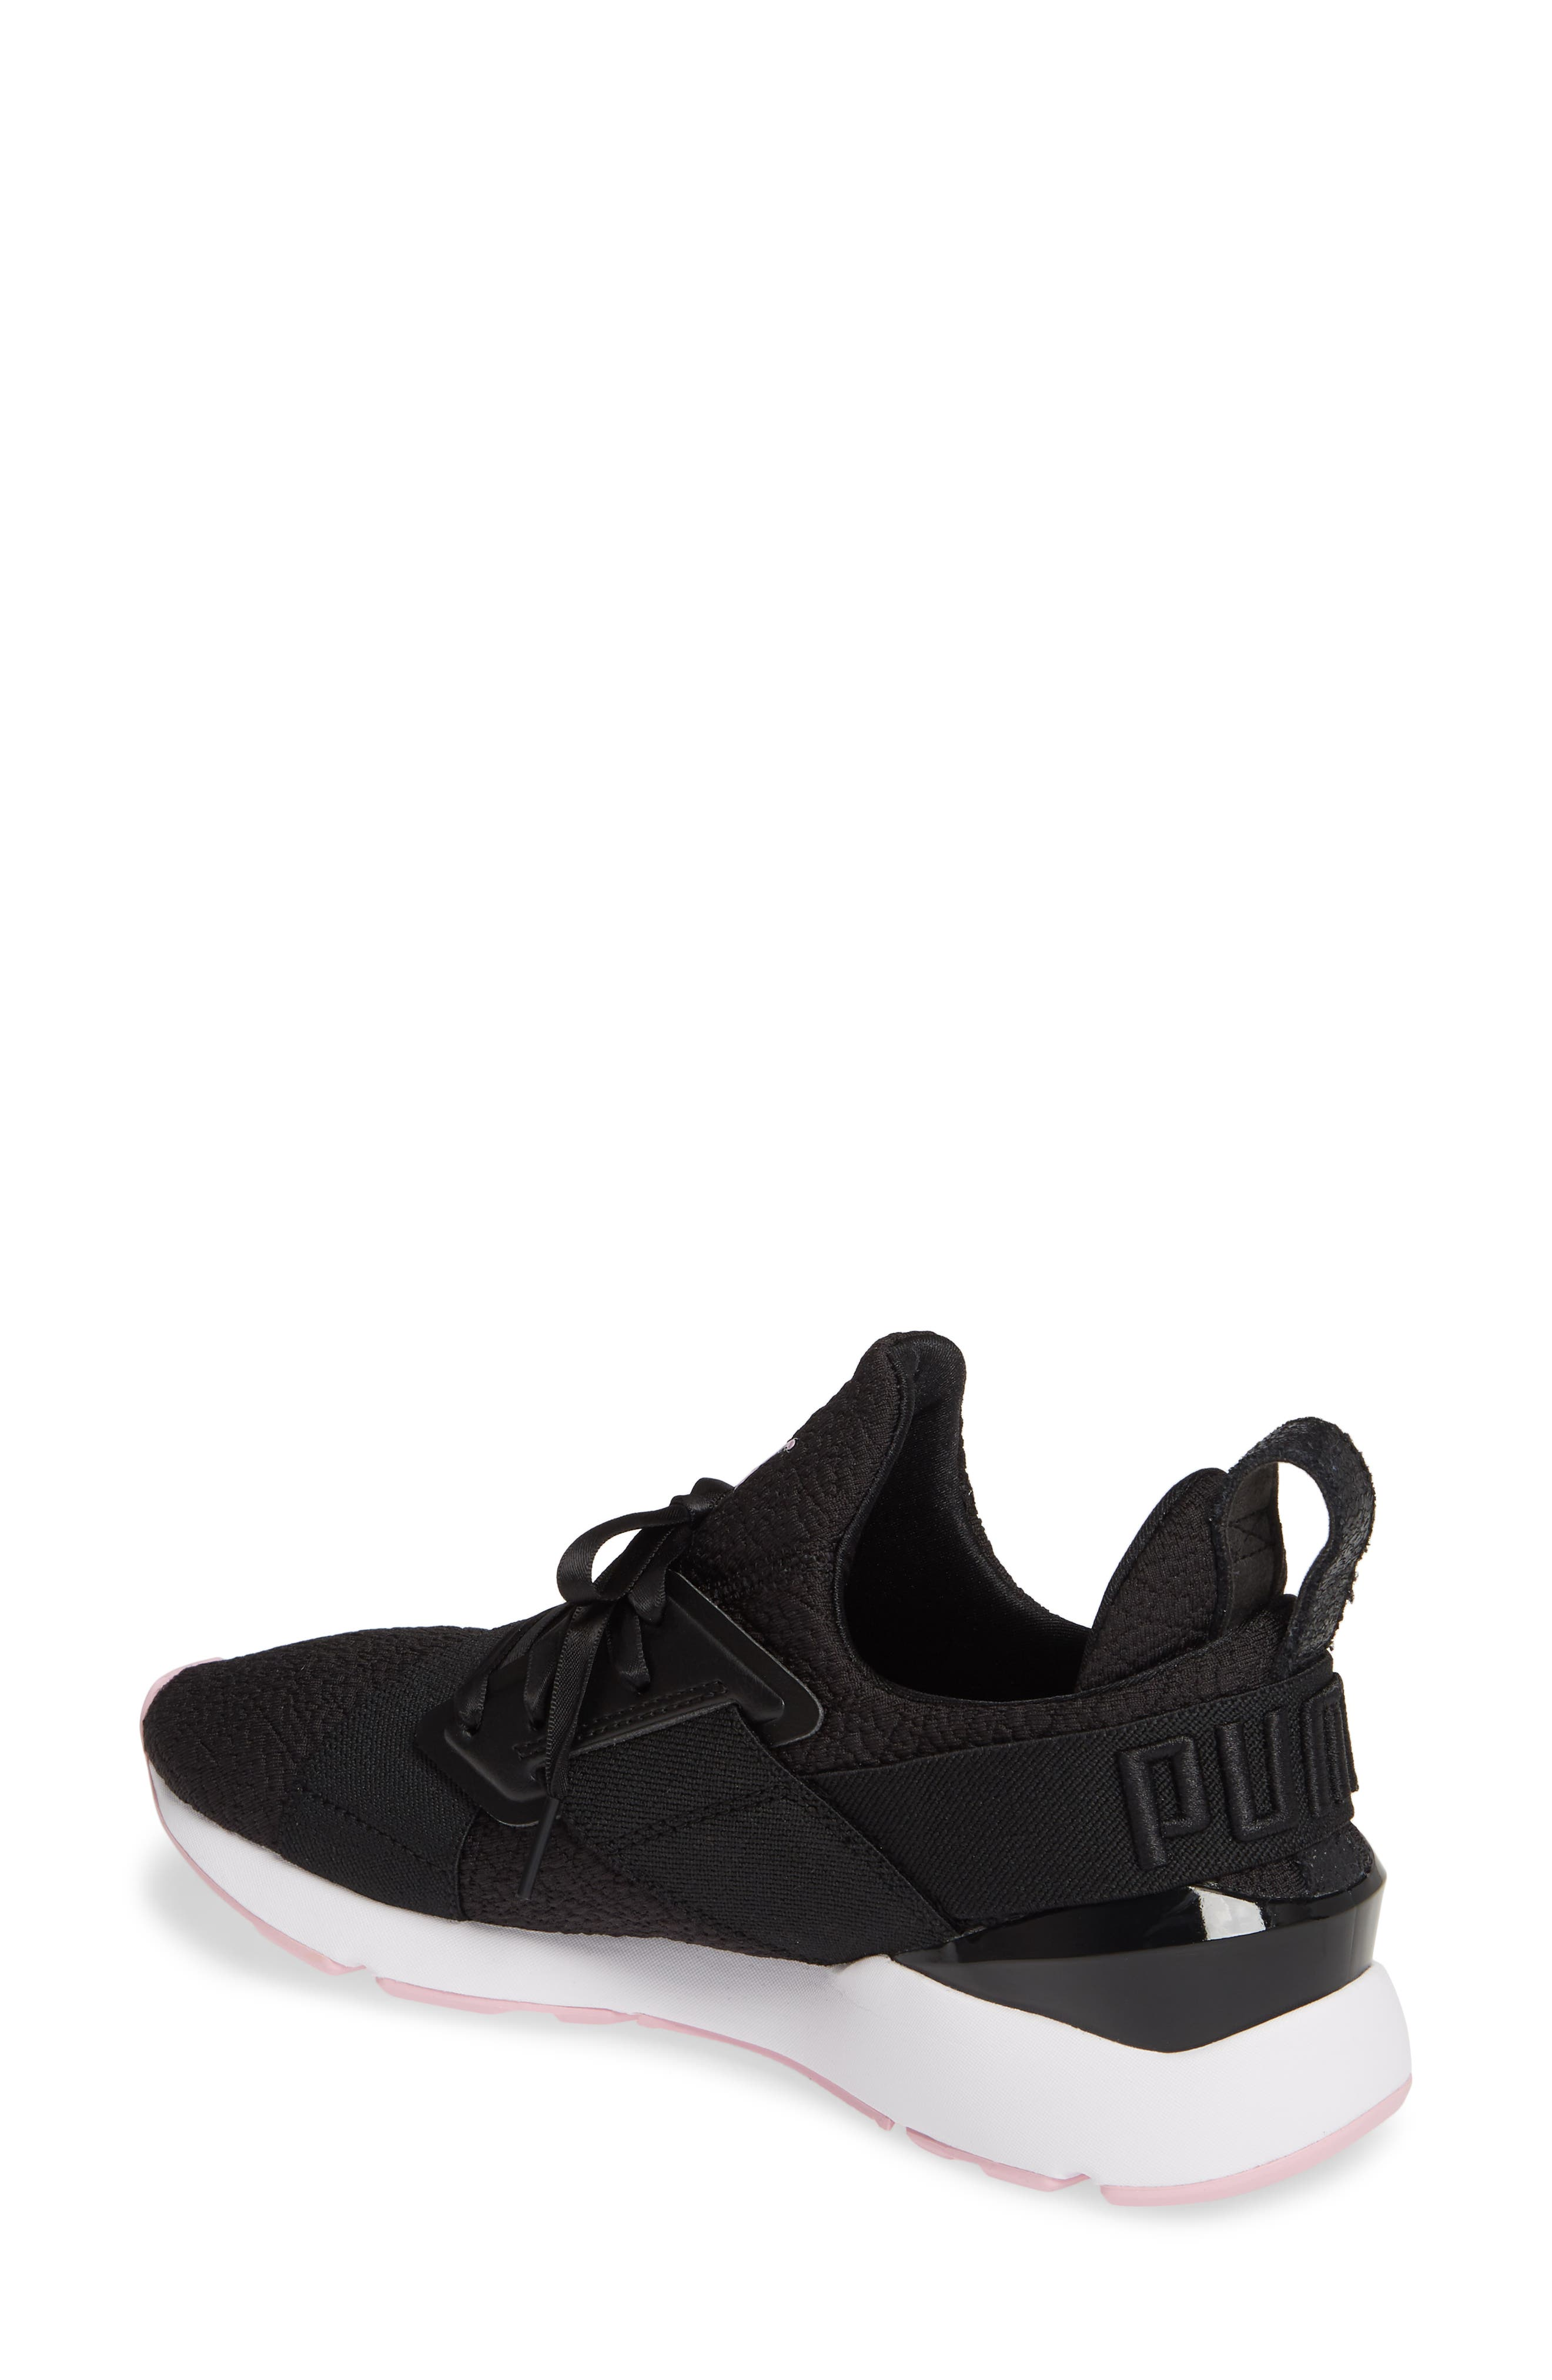 PUMA, Muse TZ Sneaker, Alternate thumbnail 2, color, BLACK/ PALE PINK